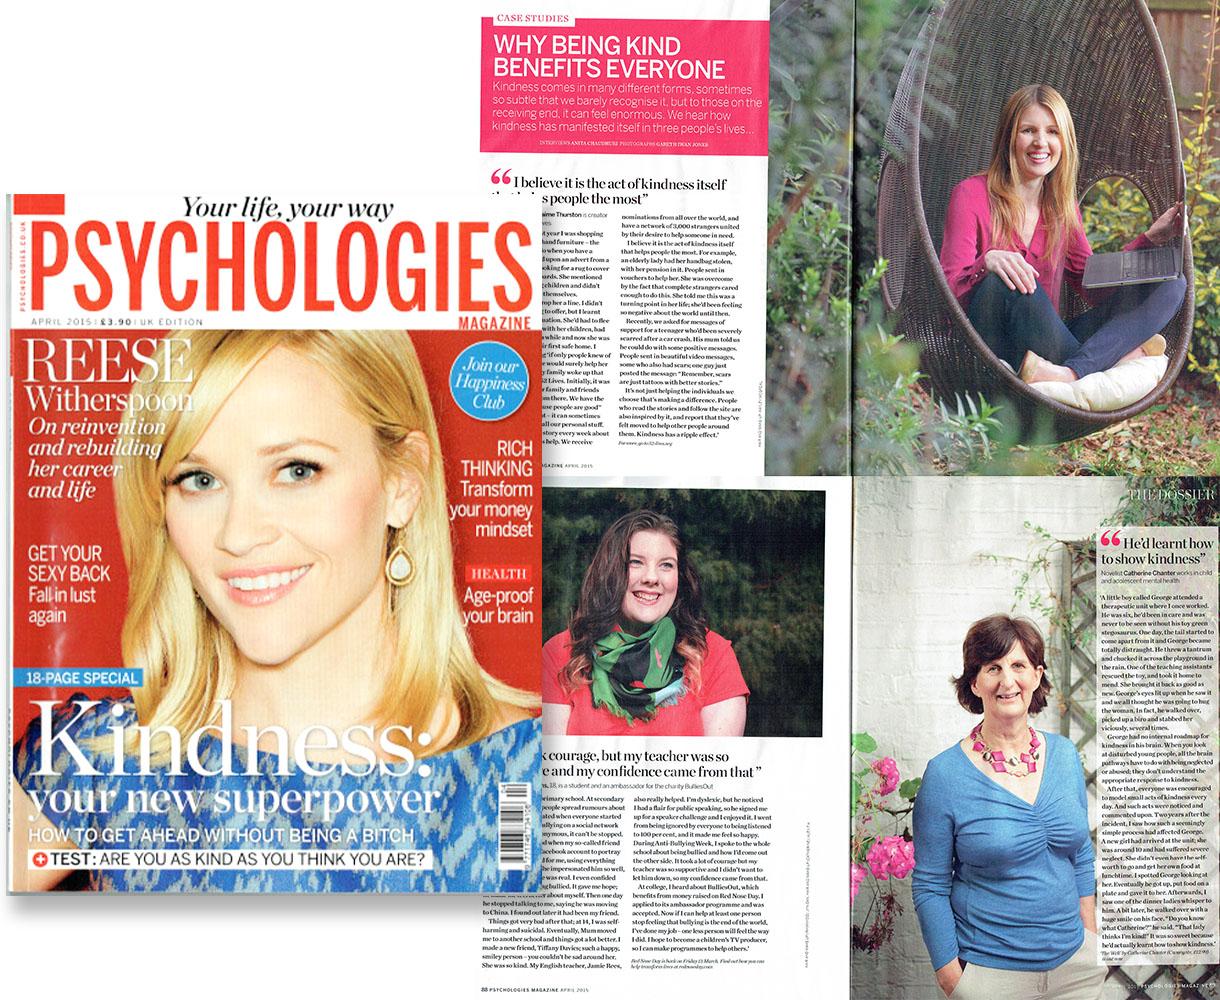 Magazine Cover Image.jpg